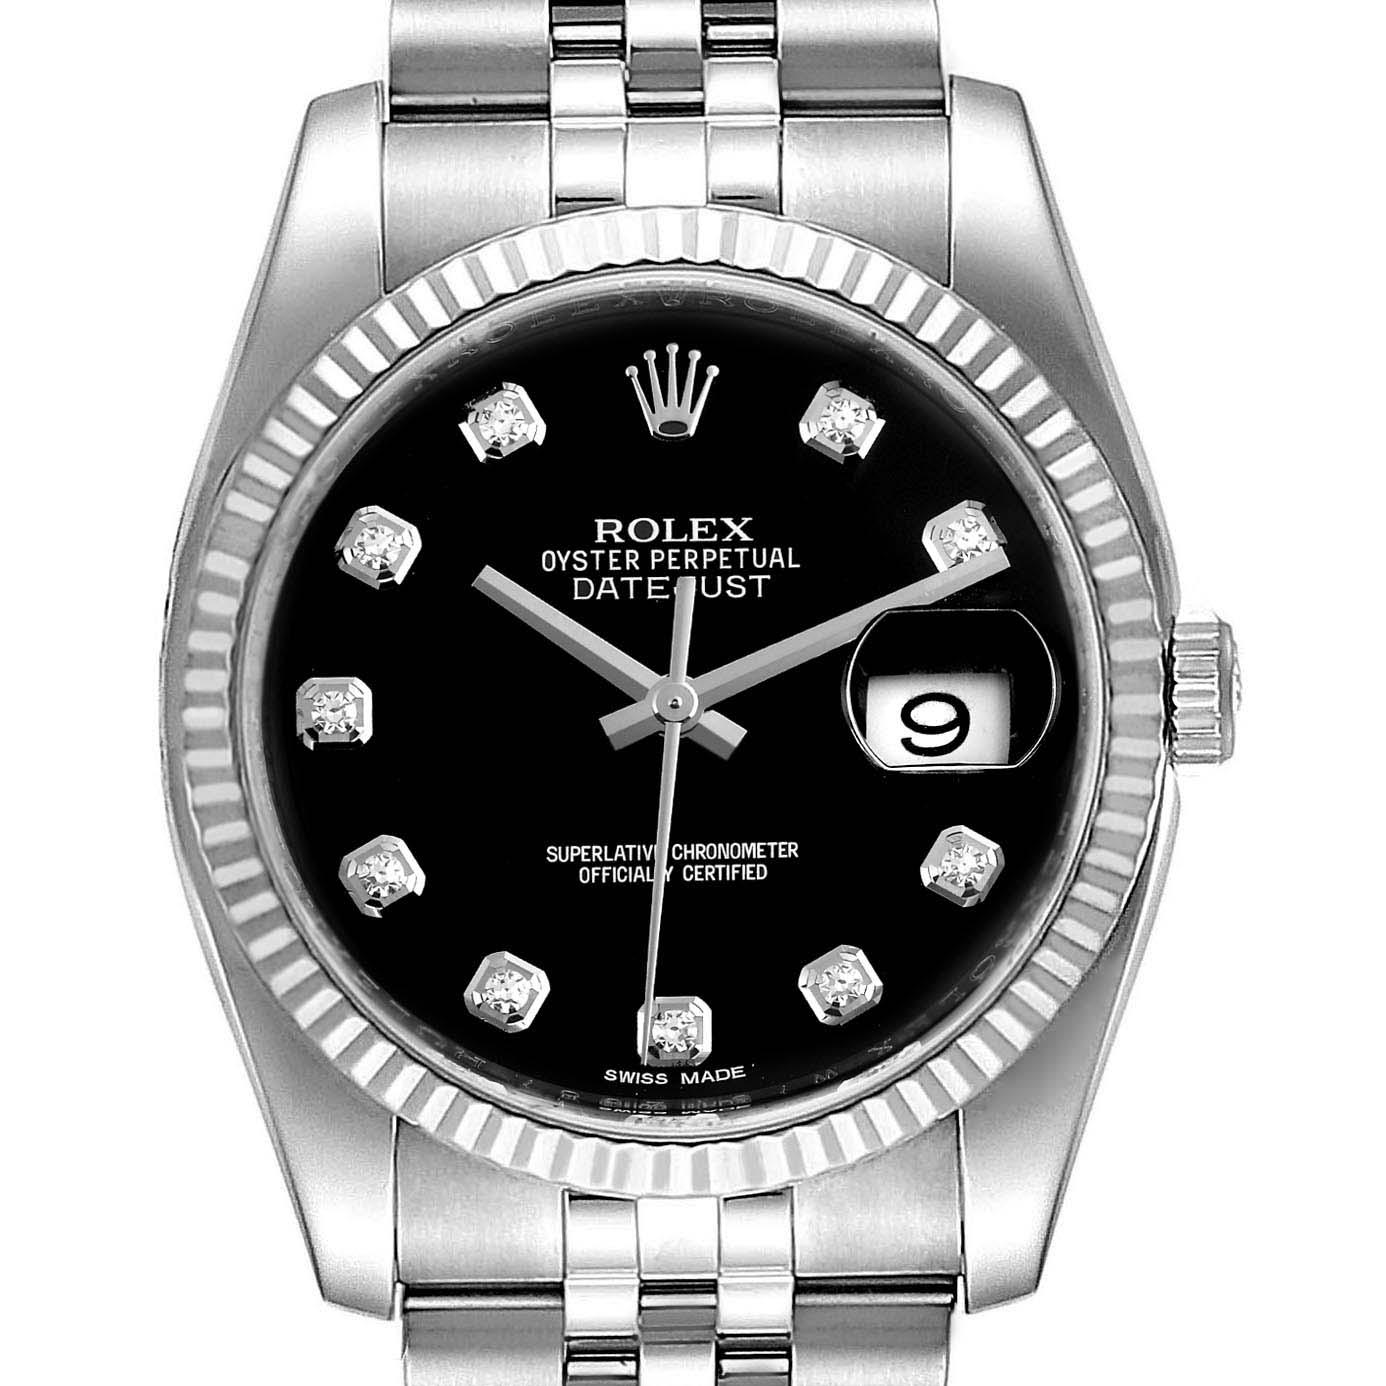 Rolex Datejust Steel White Gold Diamond Dial Mens Watch 116234 Box Card